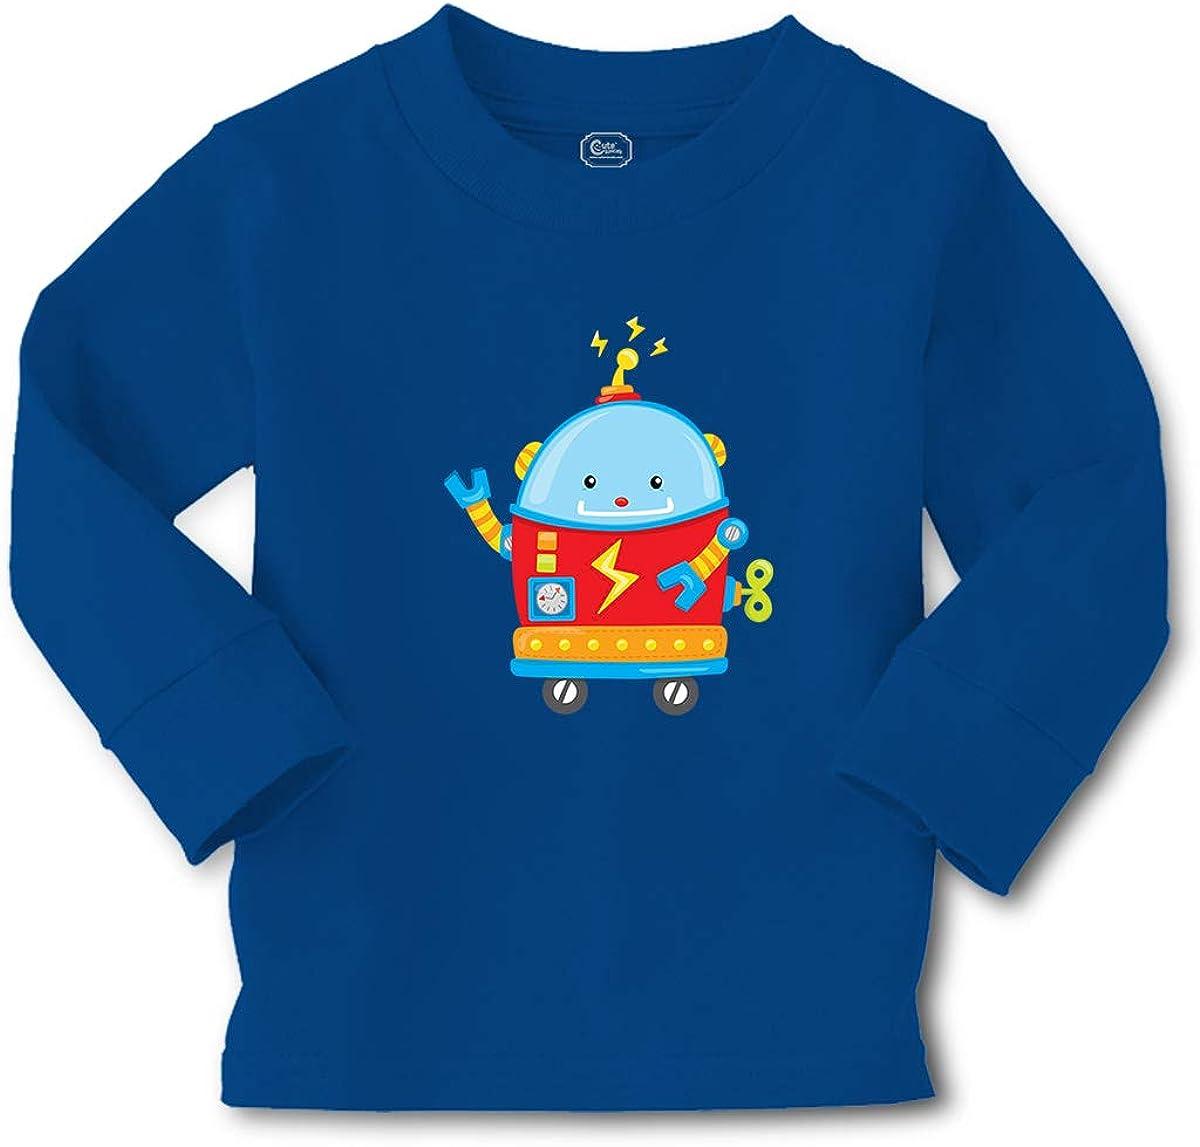 Cute Rascals Kids Long Sleeve T Shirt Small Robot Robotics Engineering Boy & Girl Clothes